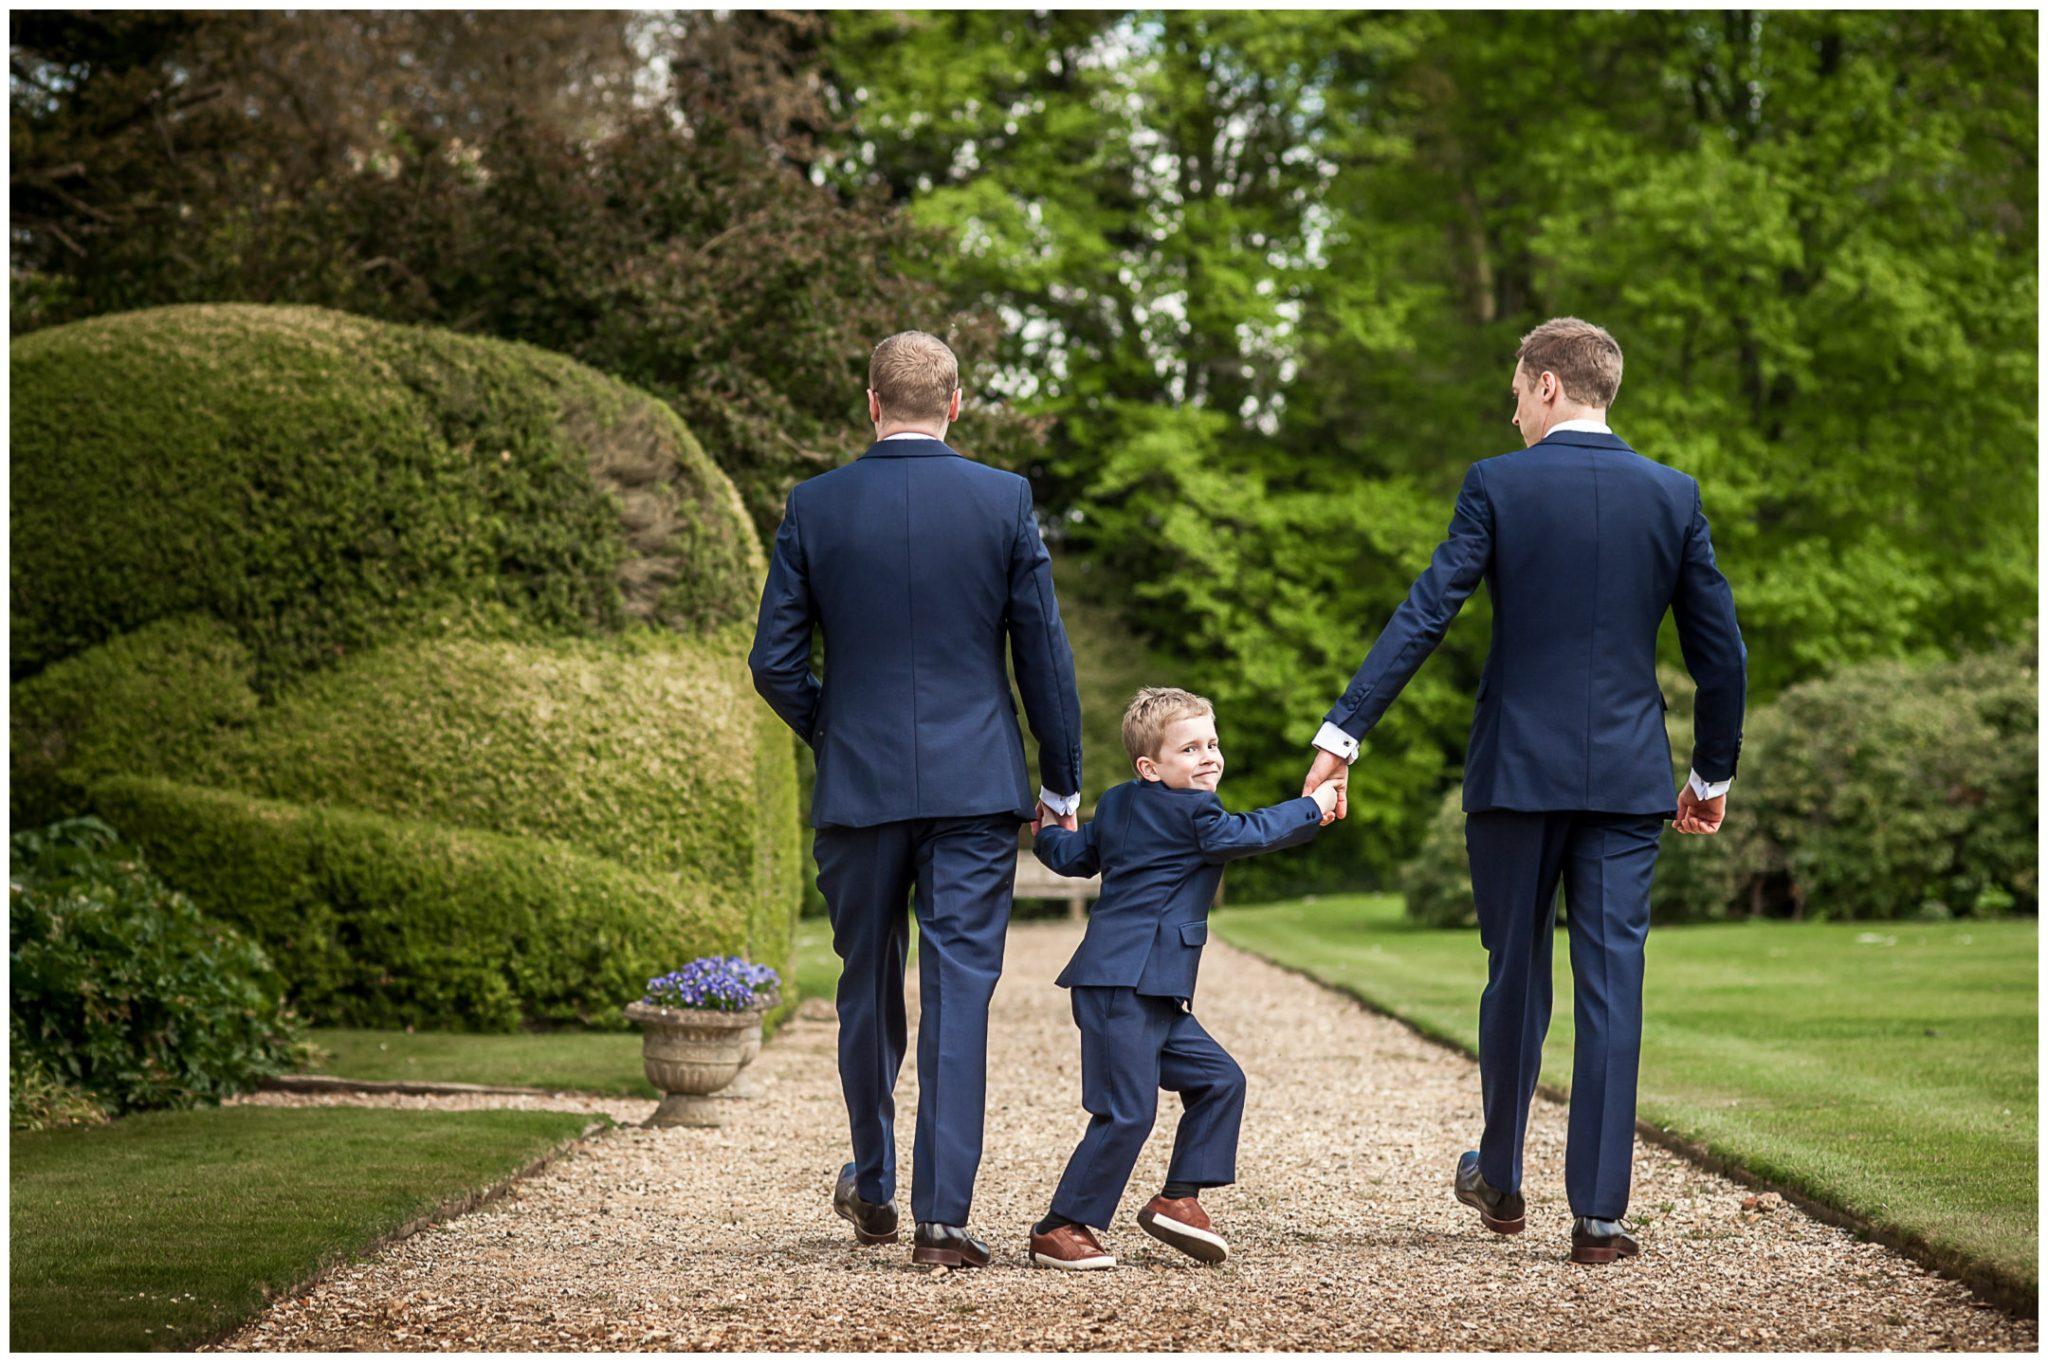 Avington Park wedding photography groomsmen walking in grounds